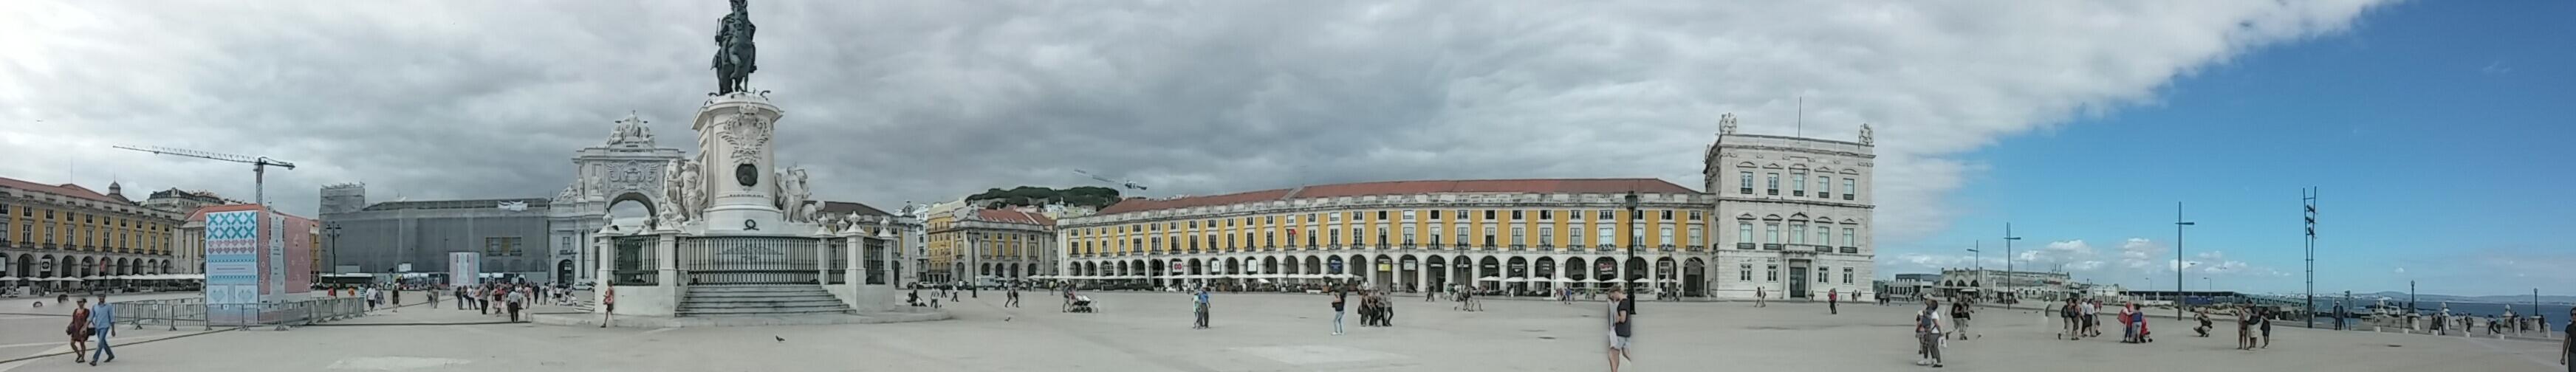 Rondreizen POrtugal Lissabon panorama